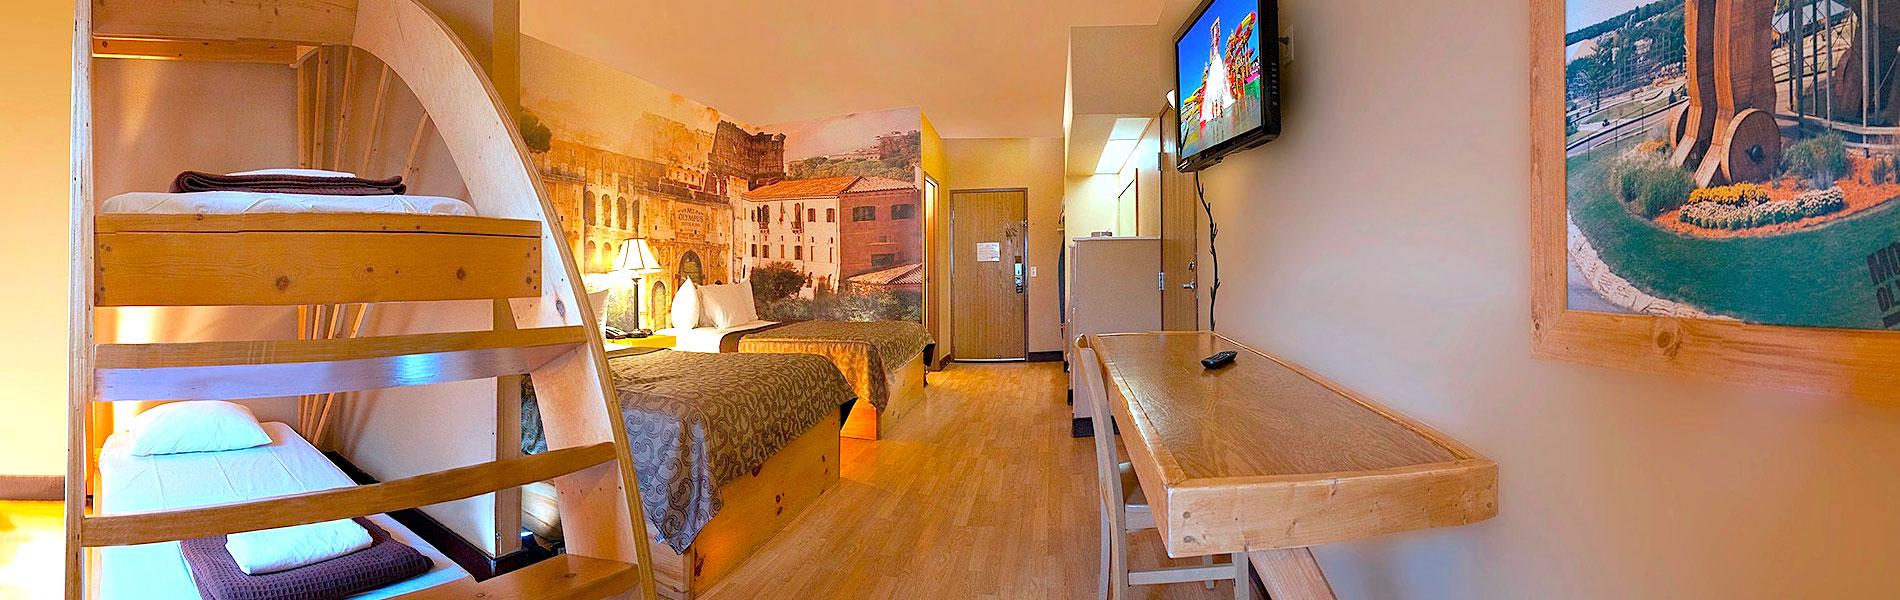 Mt Olympus Hotel Rome 2 Bedroom Unit Pictures